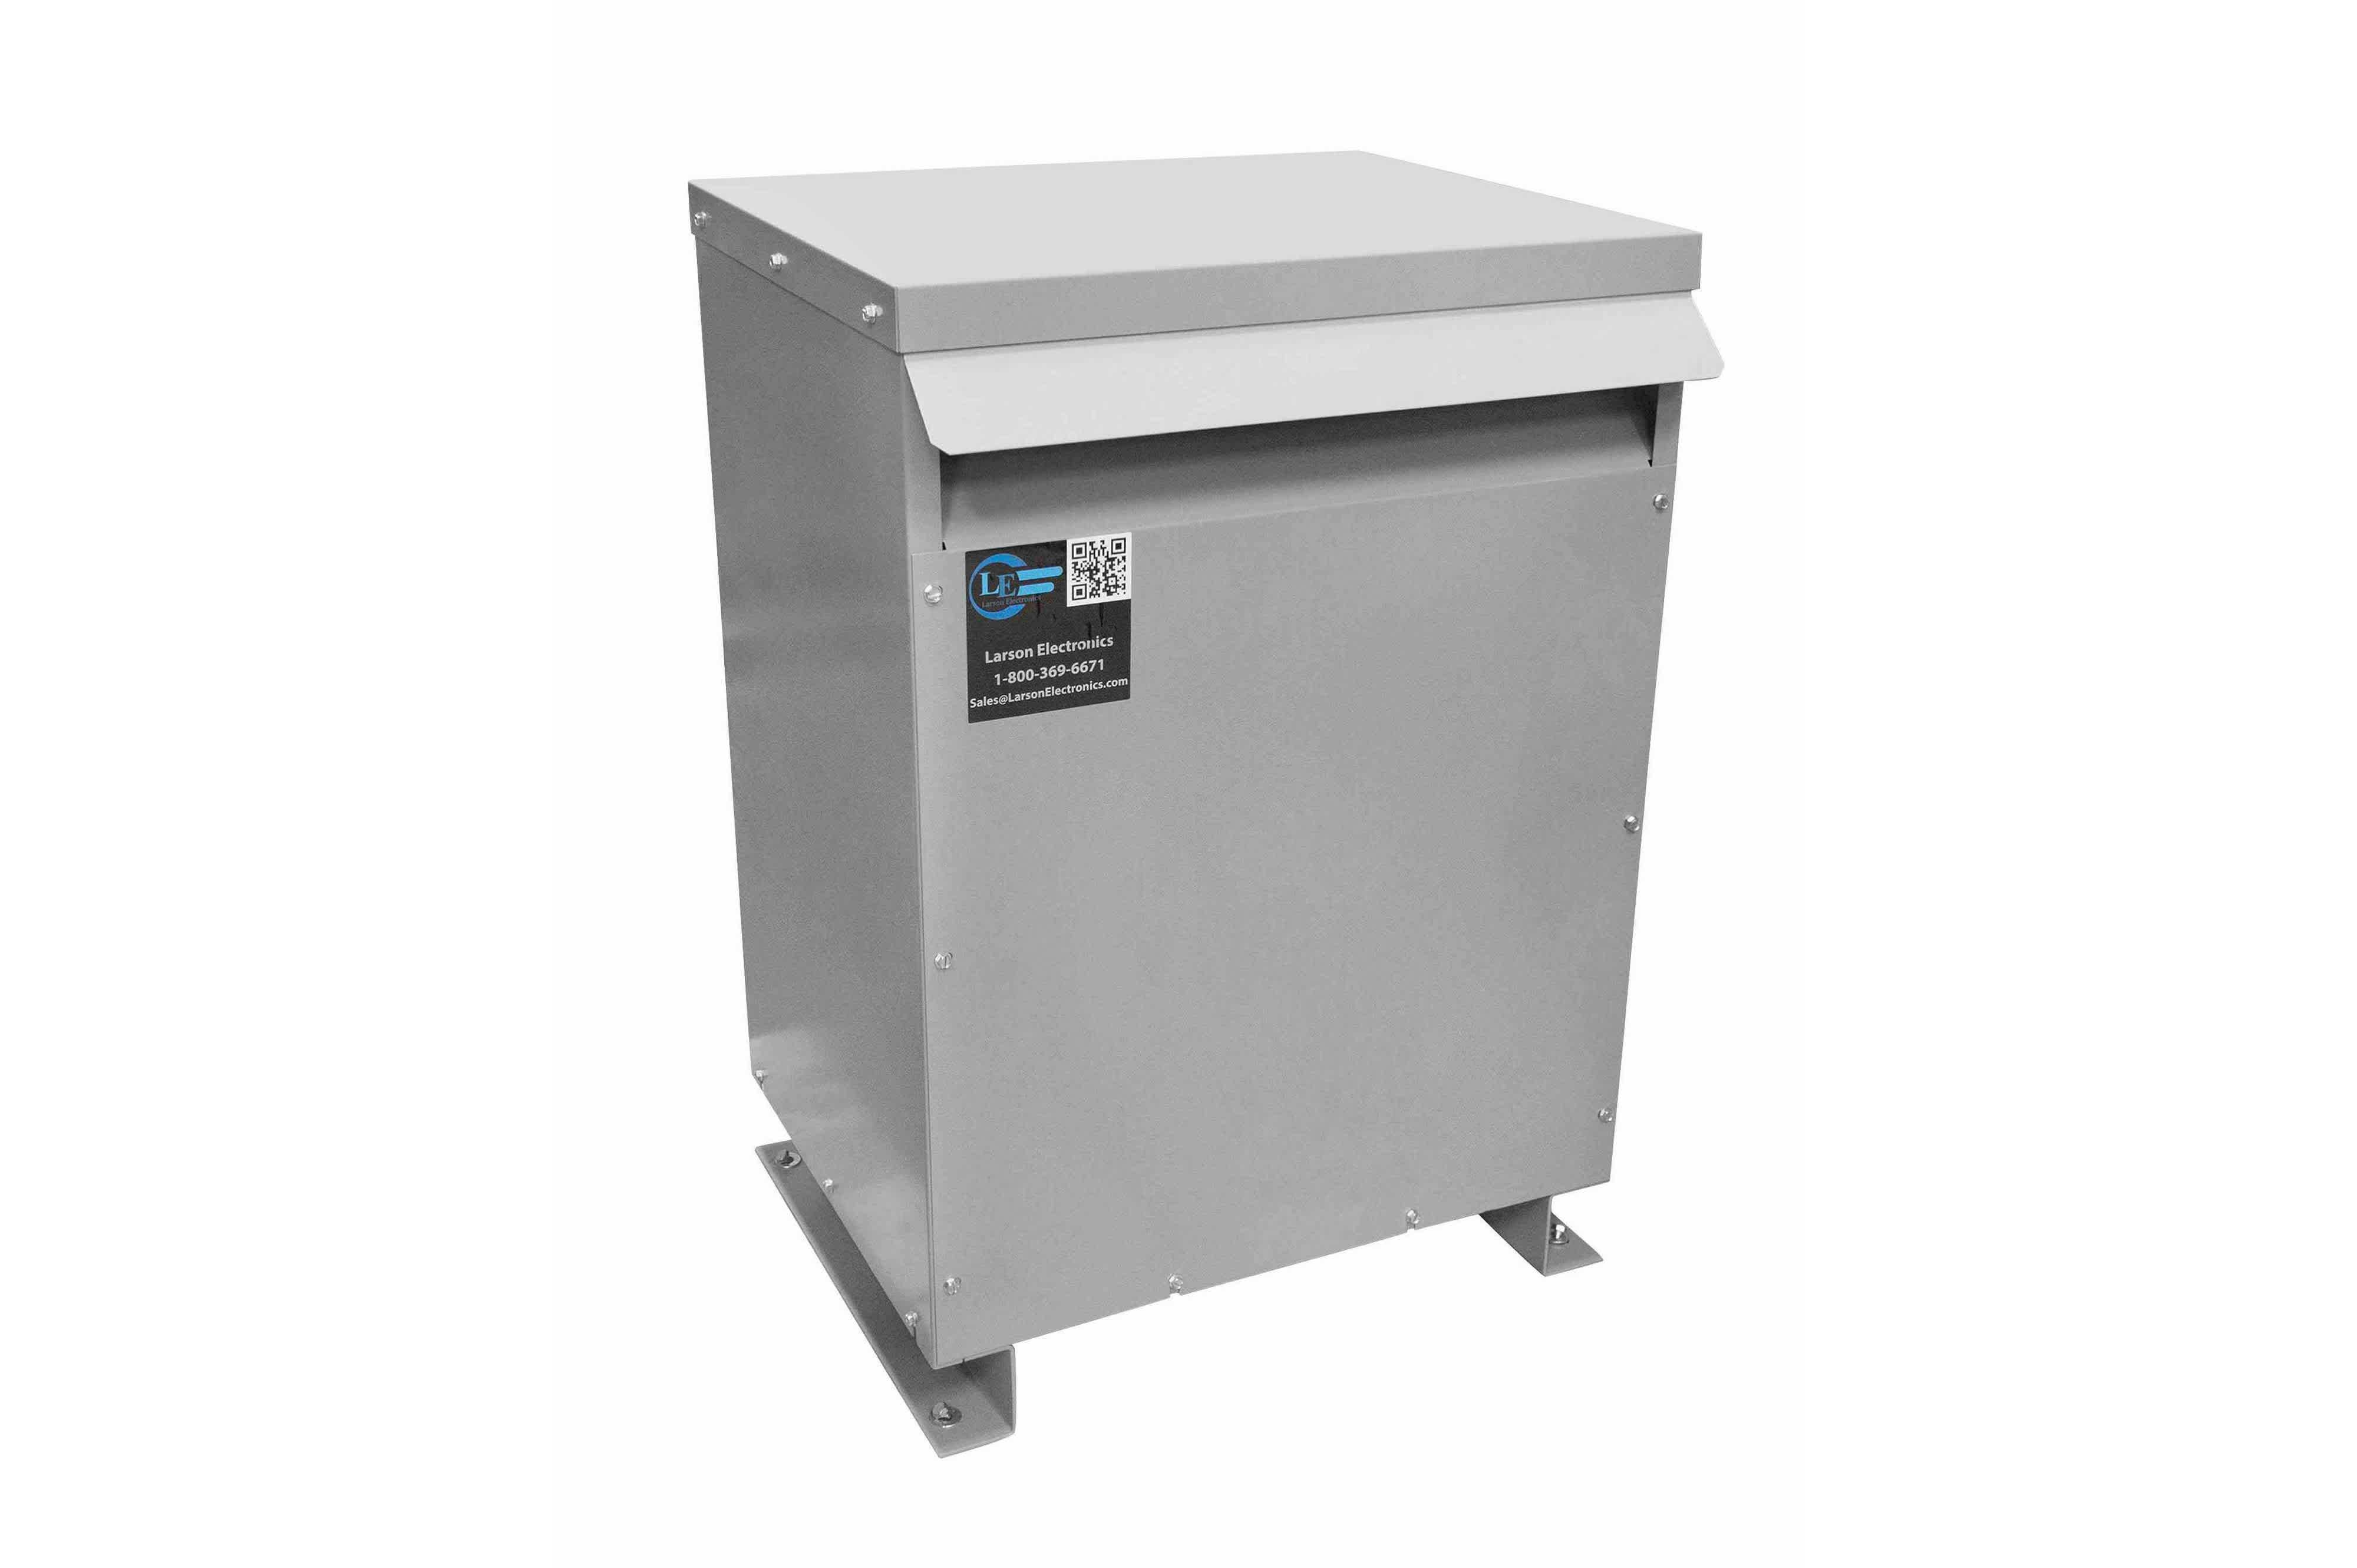 20 kVA 3PH Isolation Transformer, 208V Wye Primary, 600Y/347 Wye-N Secondary, N3R, Ventilated, 60 Hz